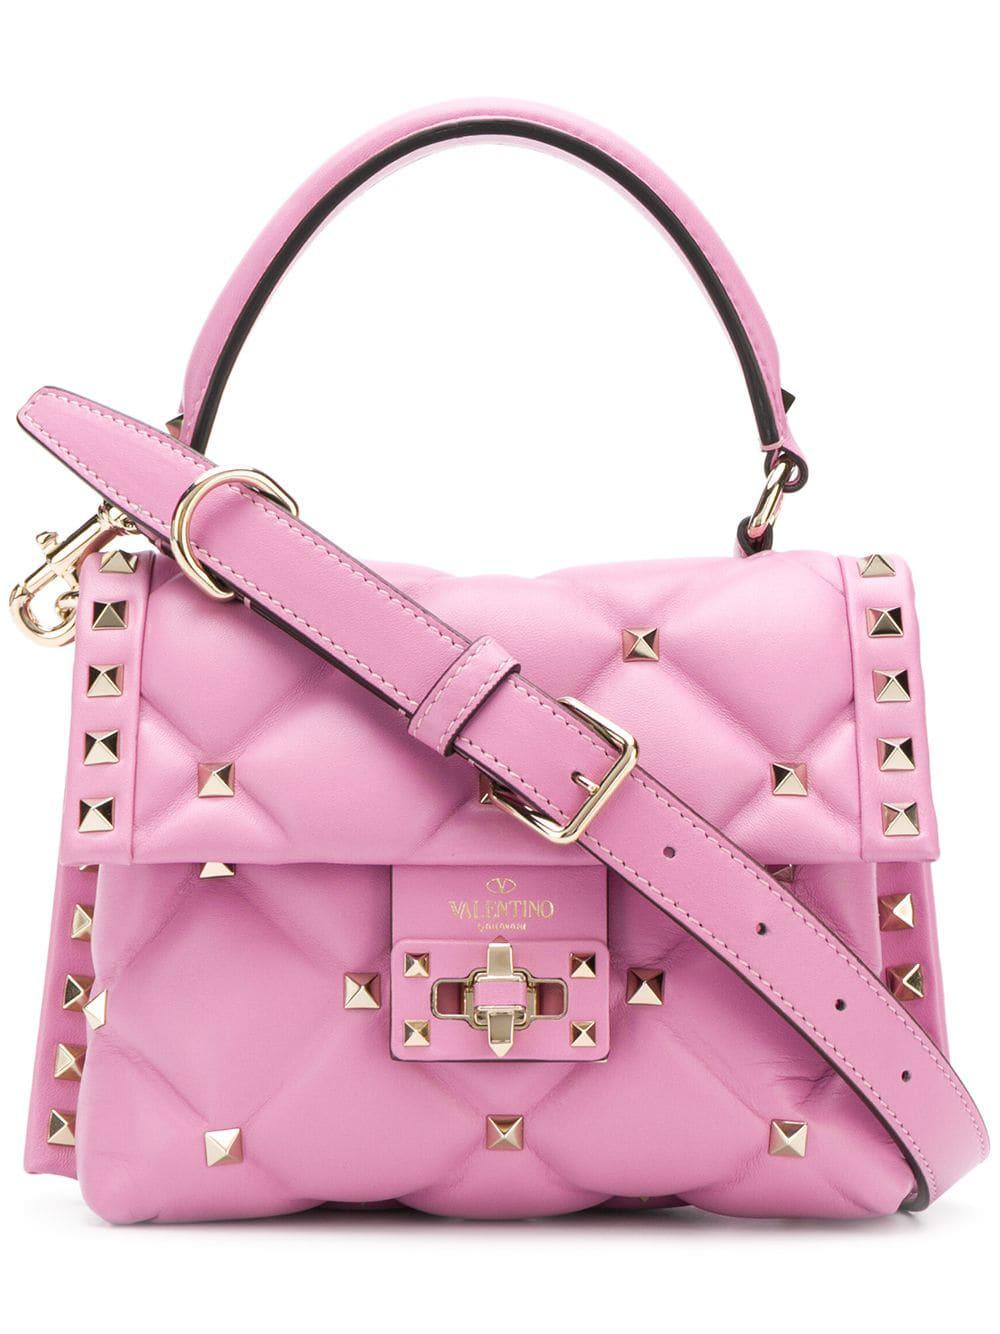 d1710674c89 Valentino Garavani Candystud Mini Tote - Pink | ModeSens